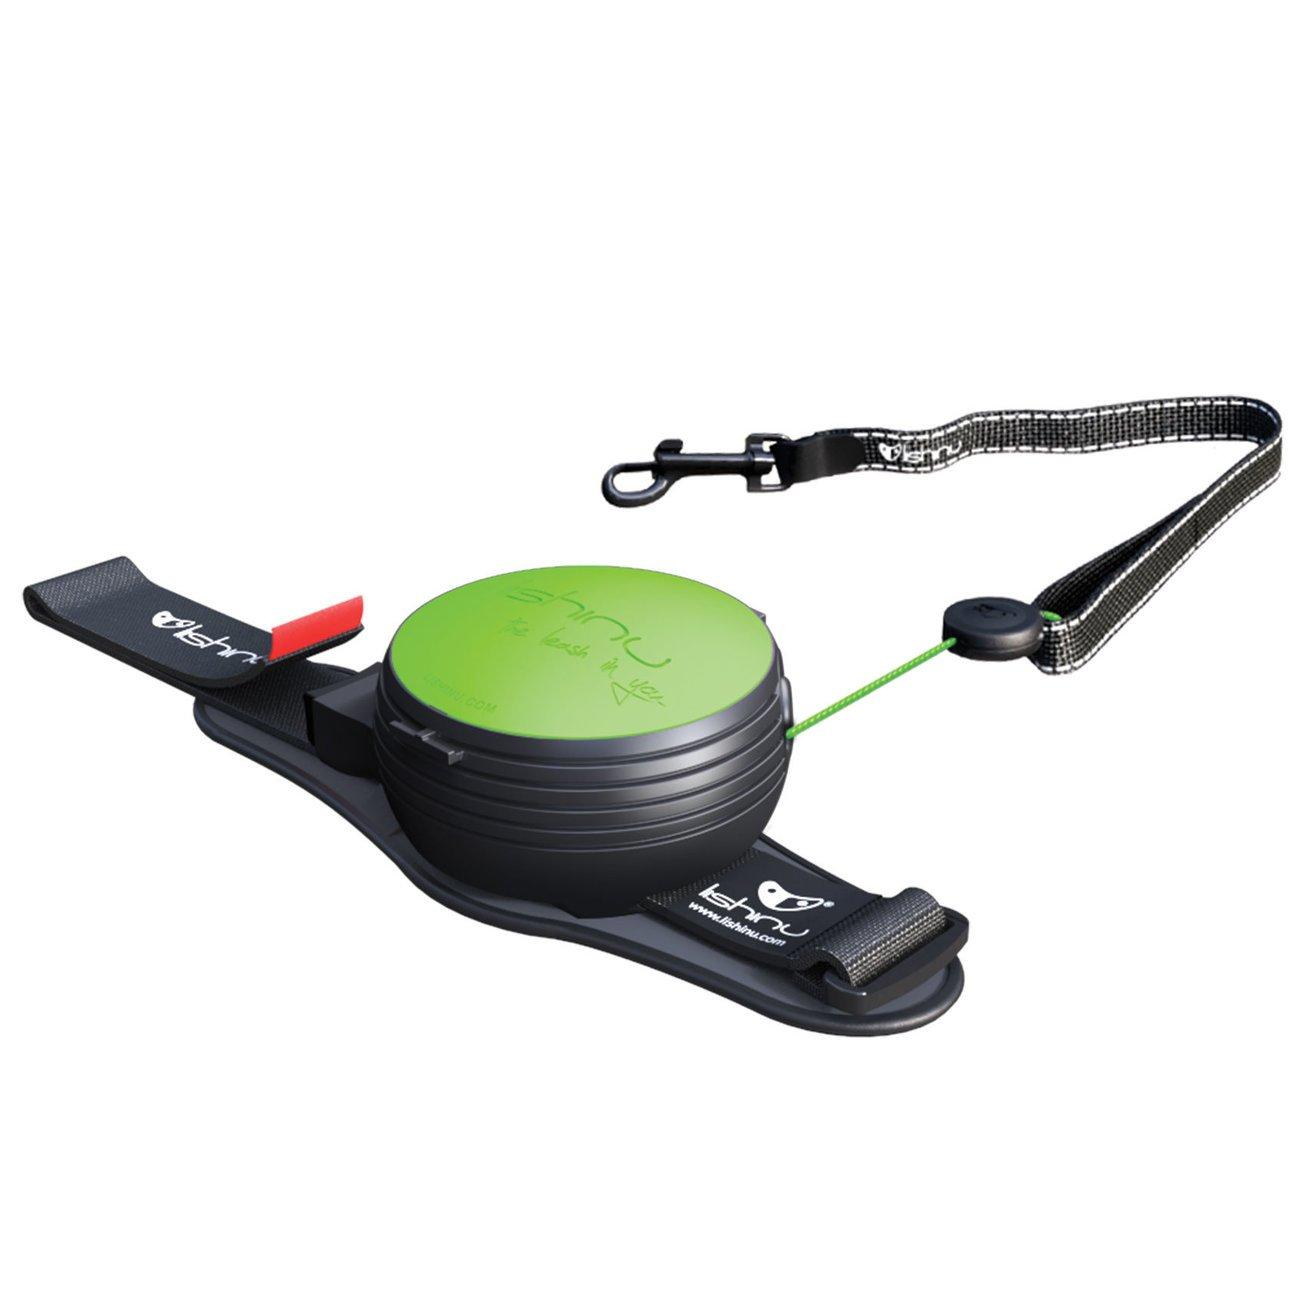 Lishinu 3 Hundeleine mit Full-STOP, XS - 2-4 kg, neon grün